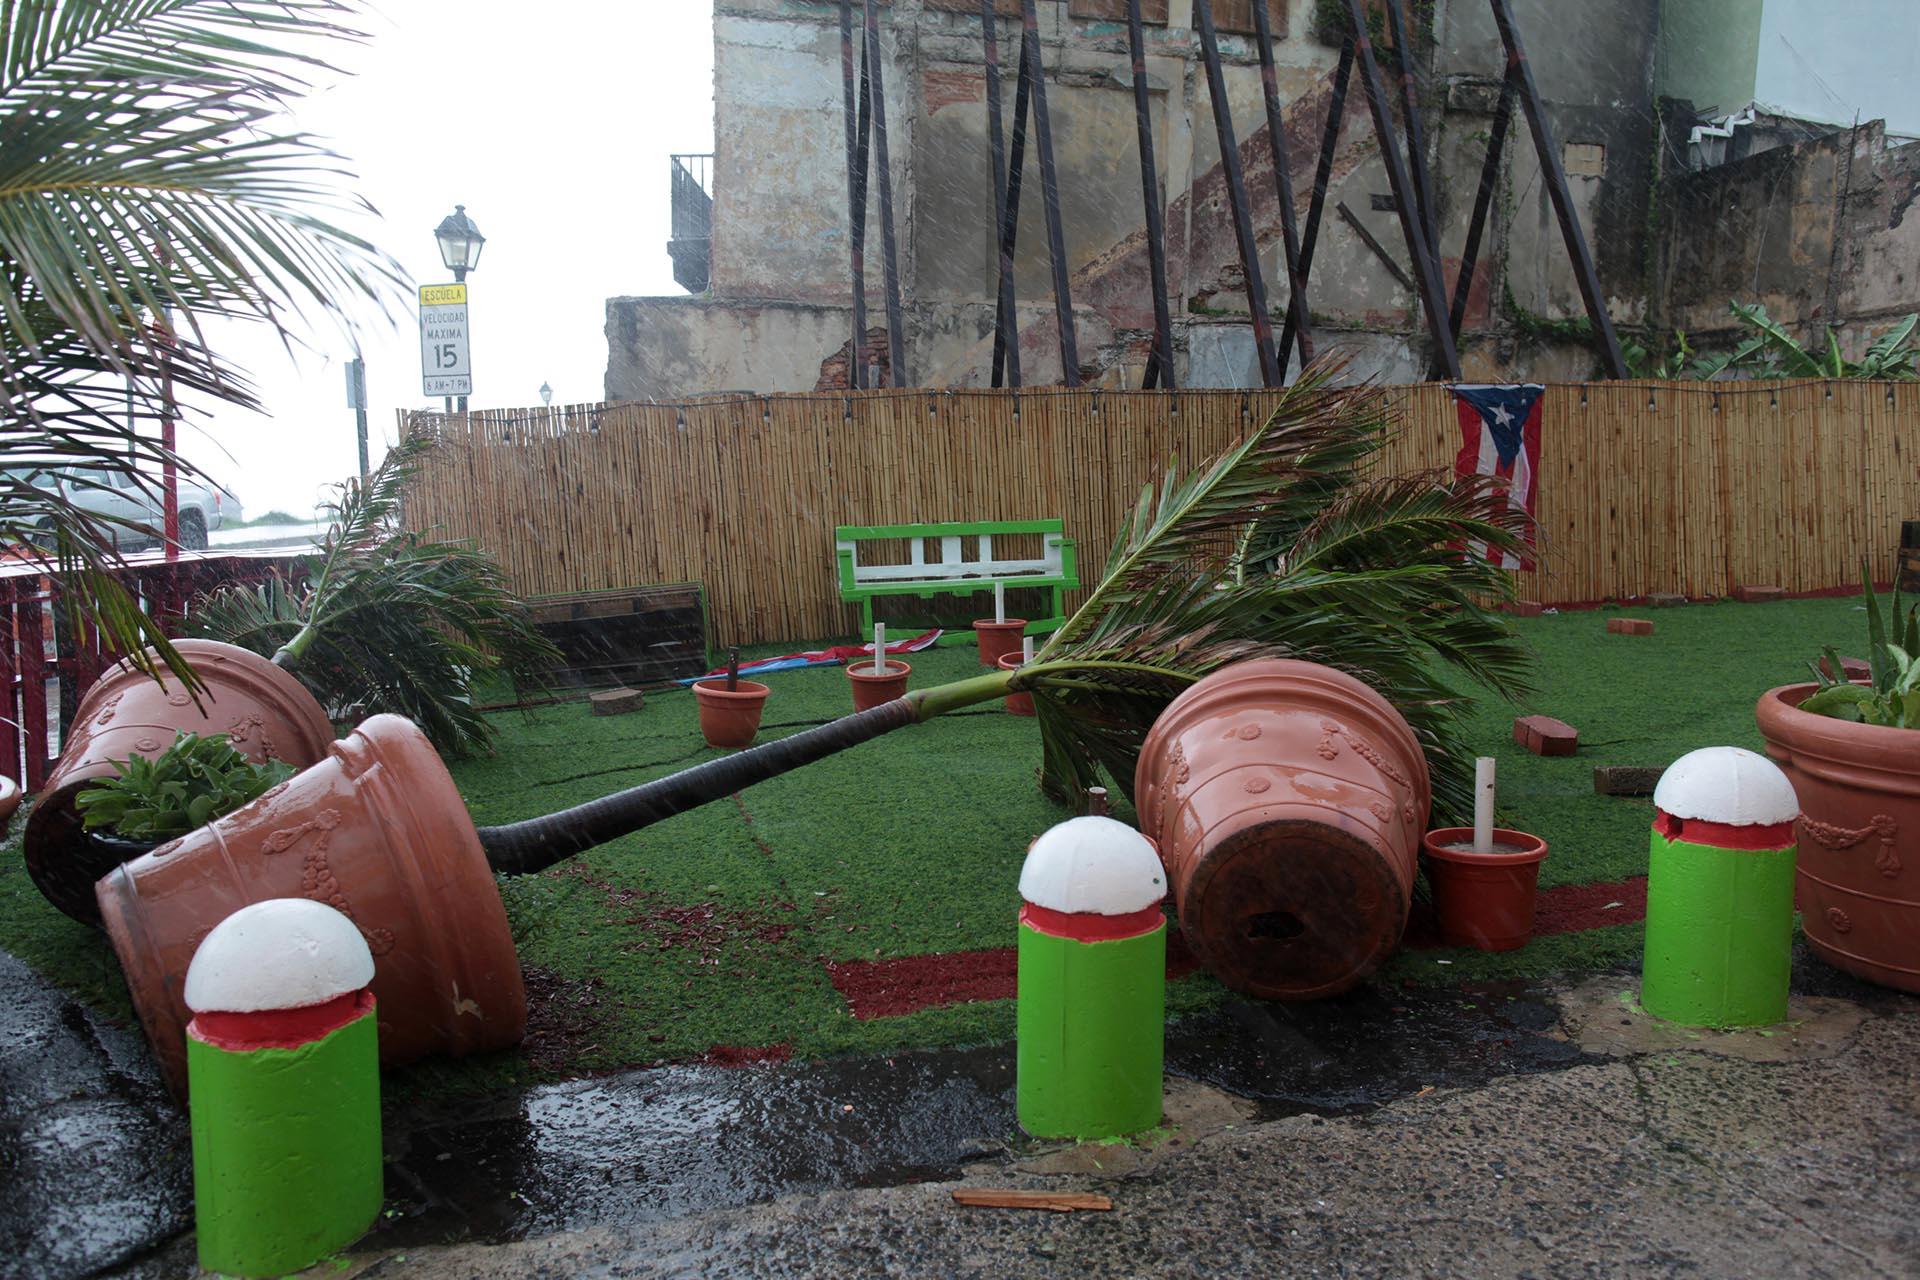 San Juan, Puerto Rico (REUTERS/Alvin Baez)